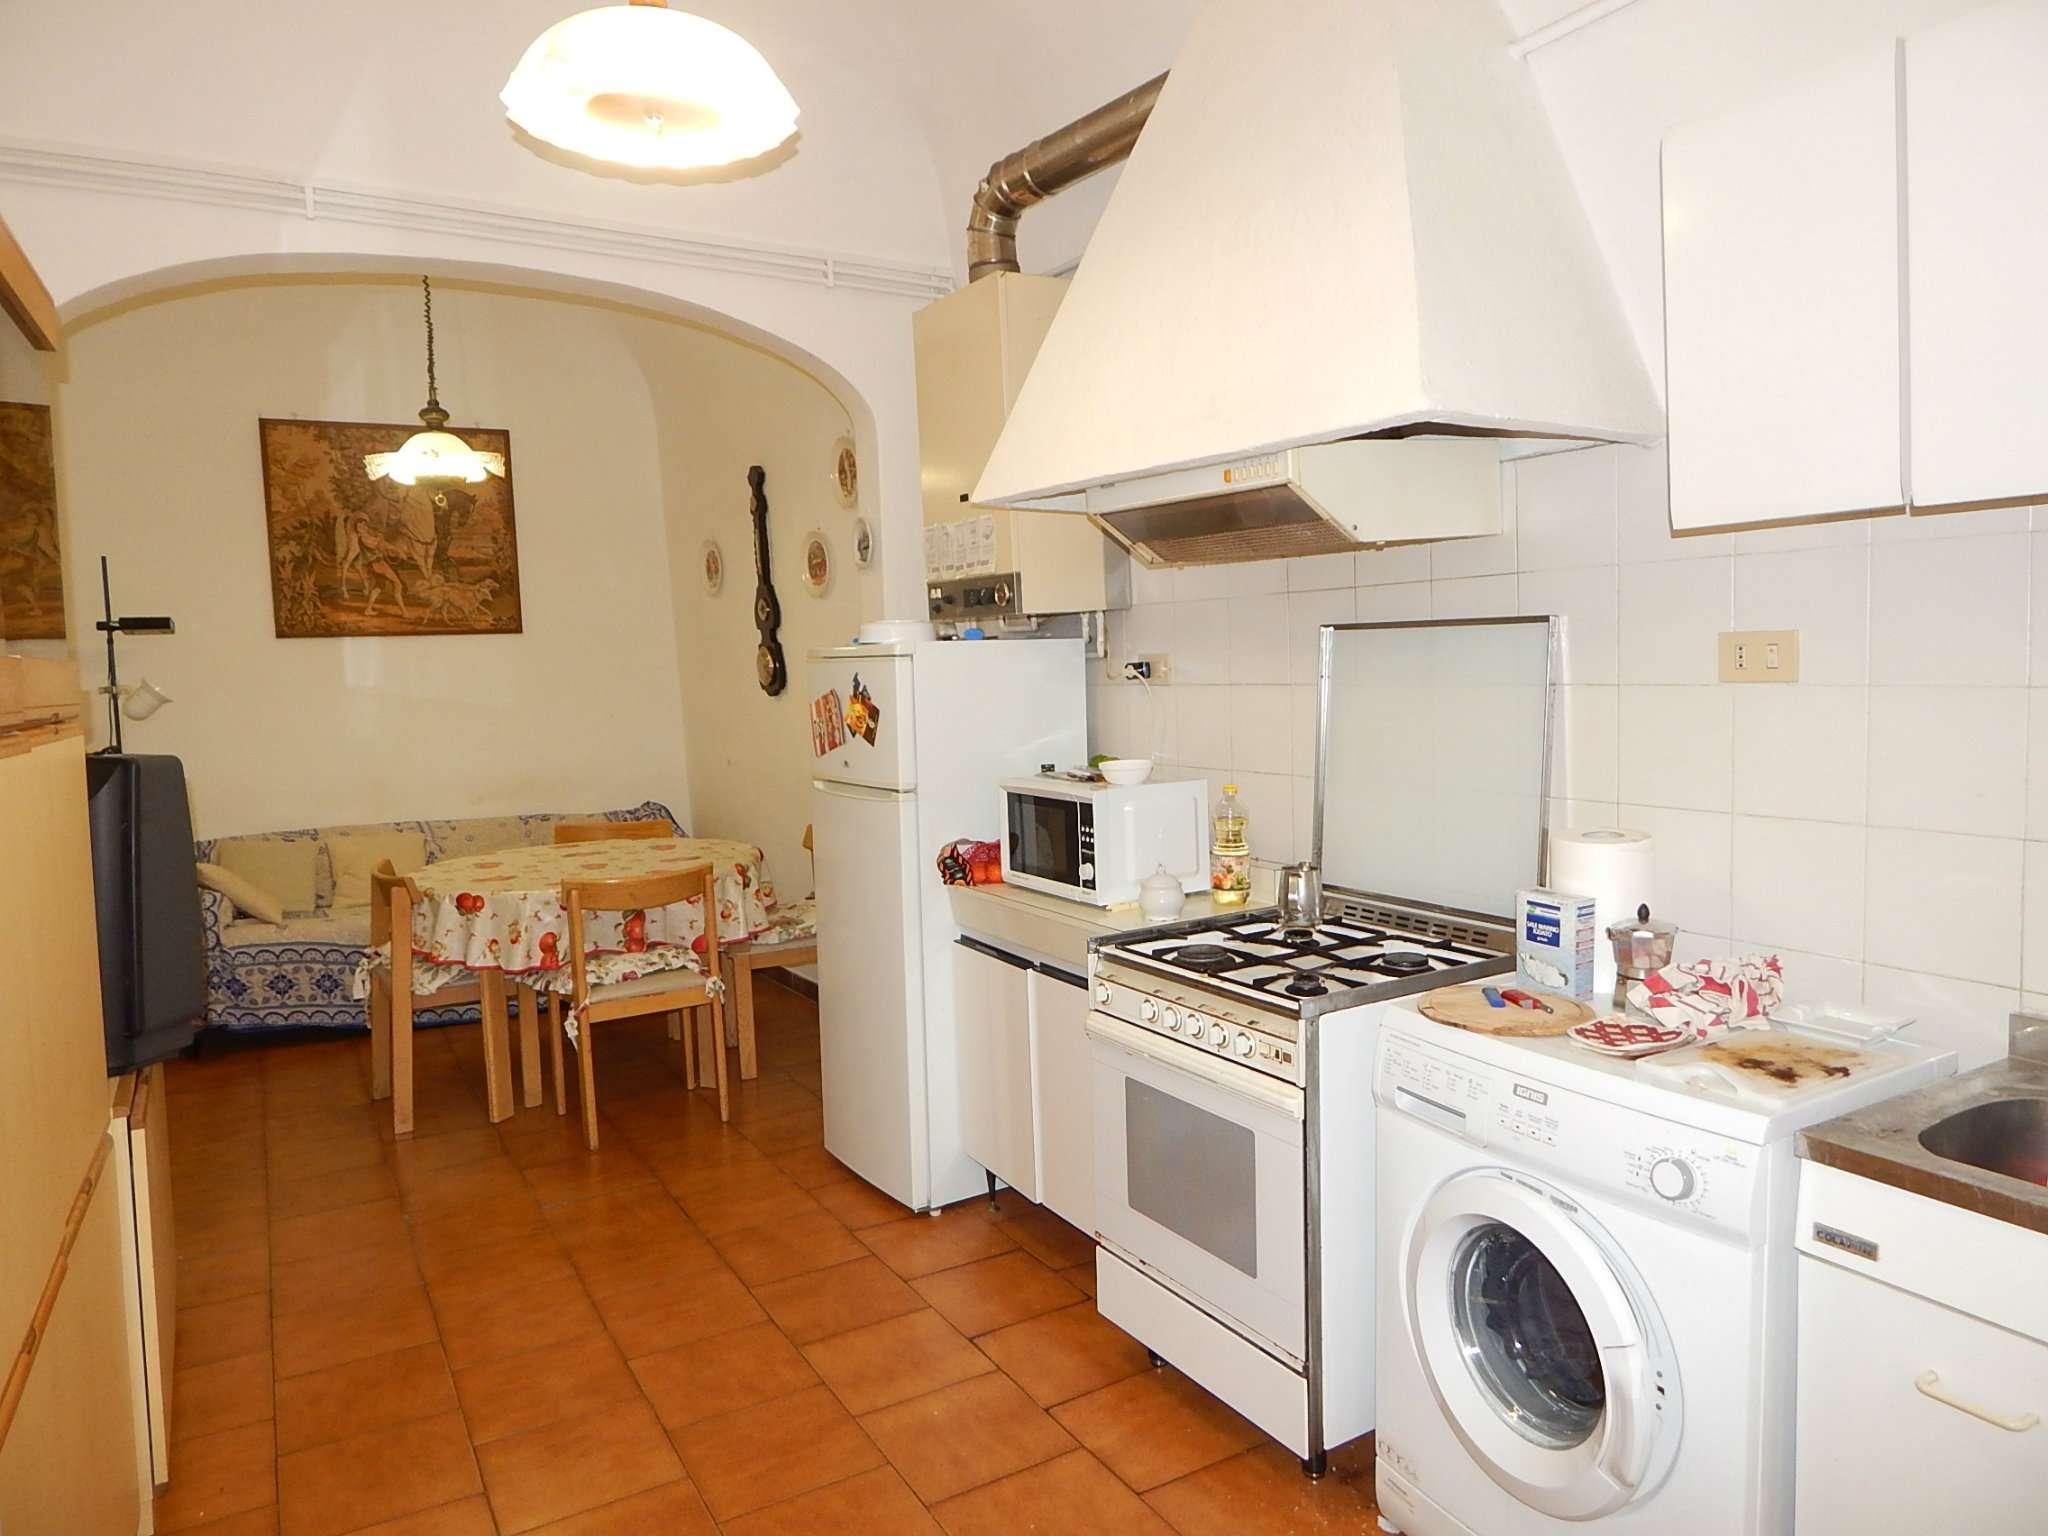 Appartamento, kinzica, Centro Storico, Vendita - Pisa (Pisa)